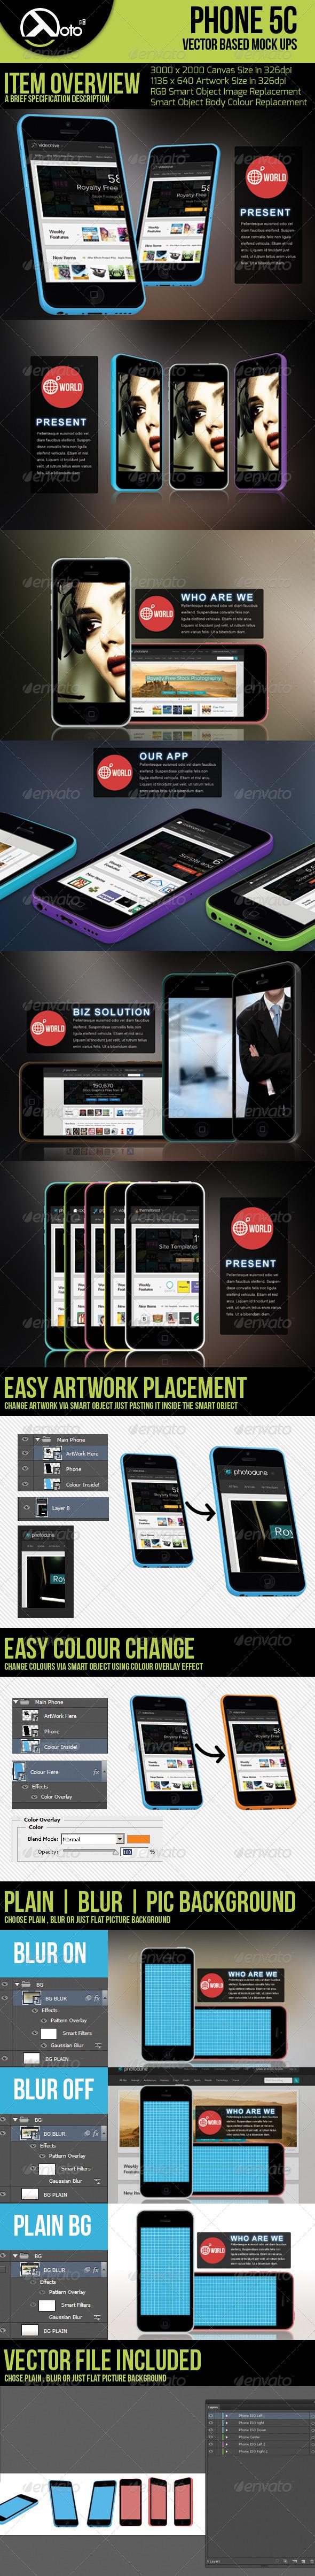 Phone 5c Vector Based Mock-up - Mobile Displays